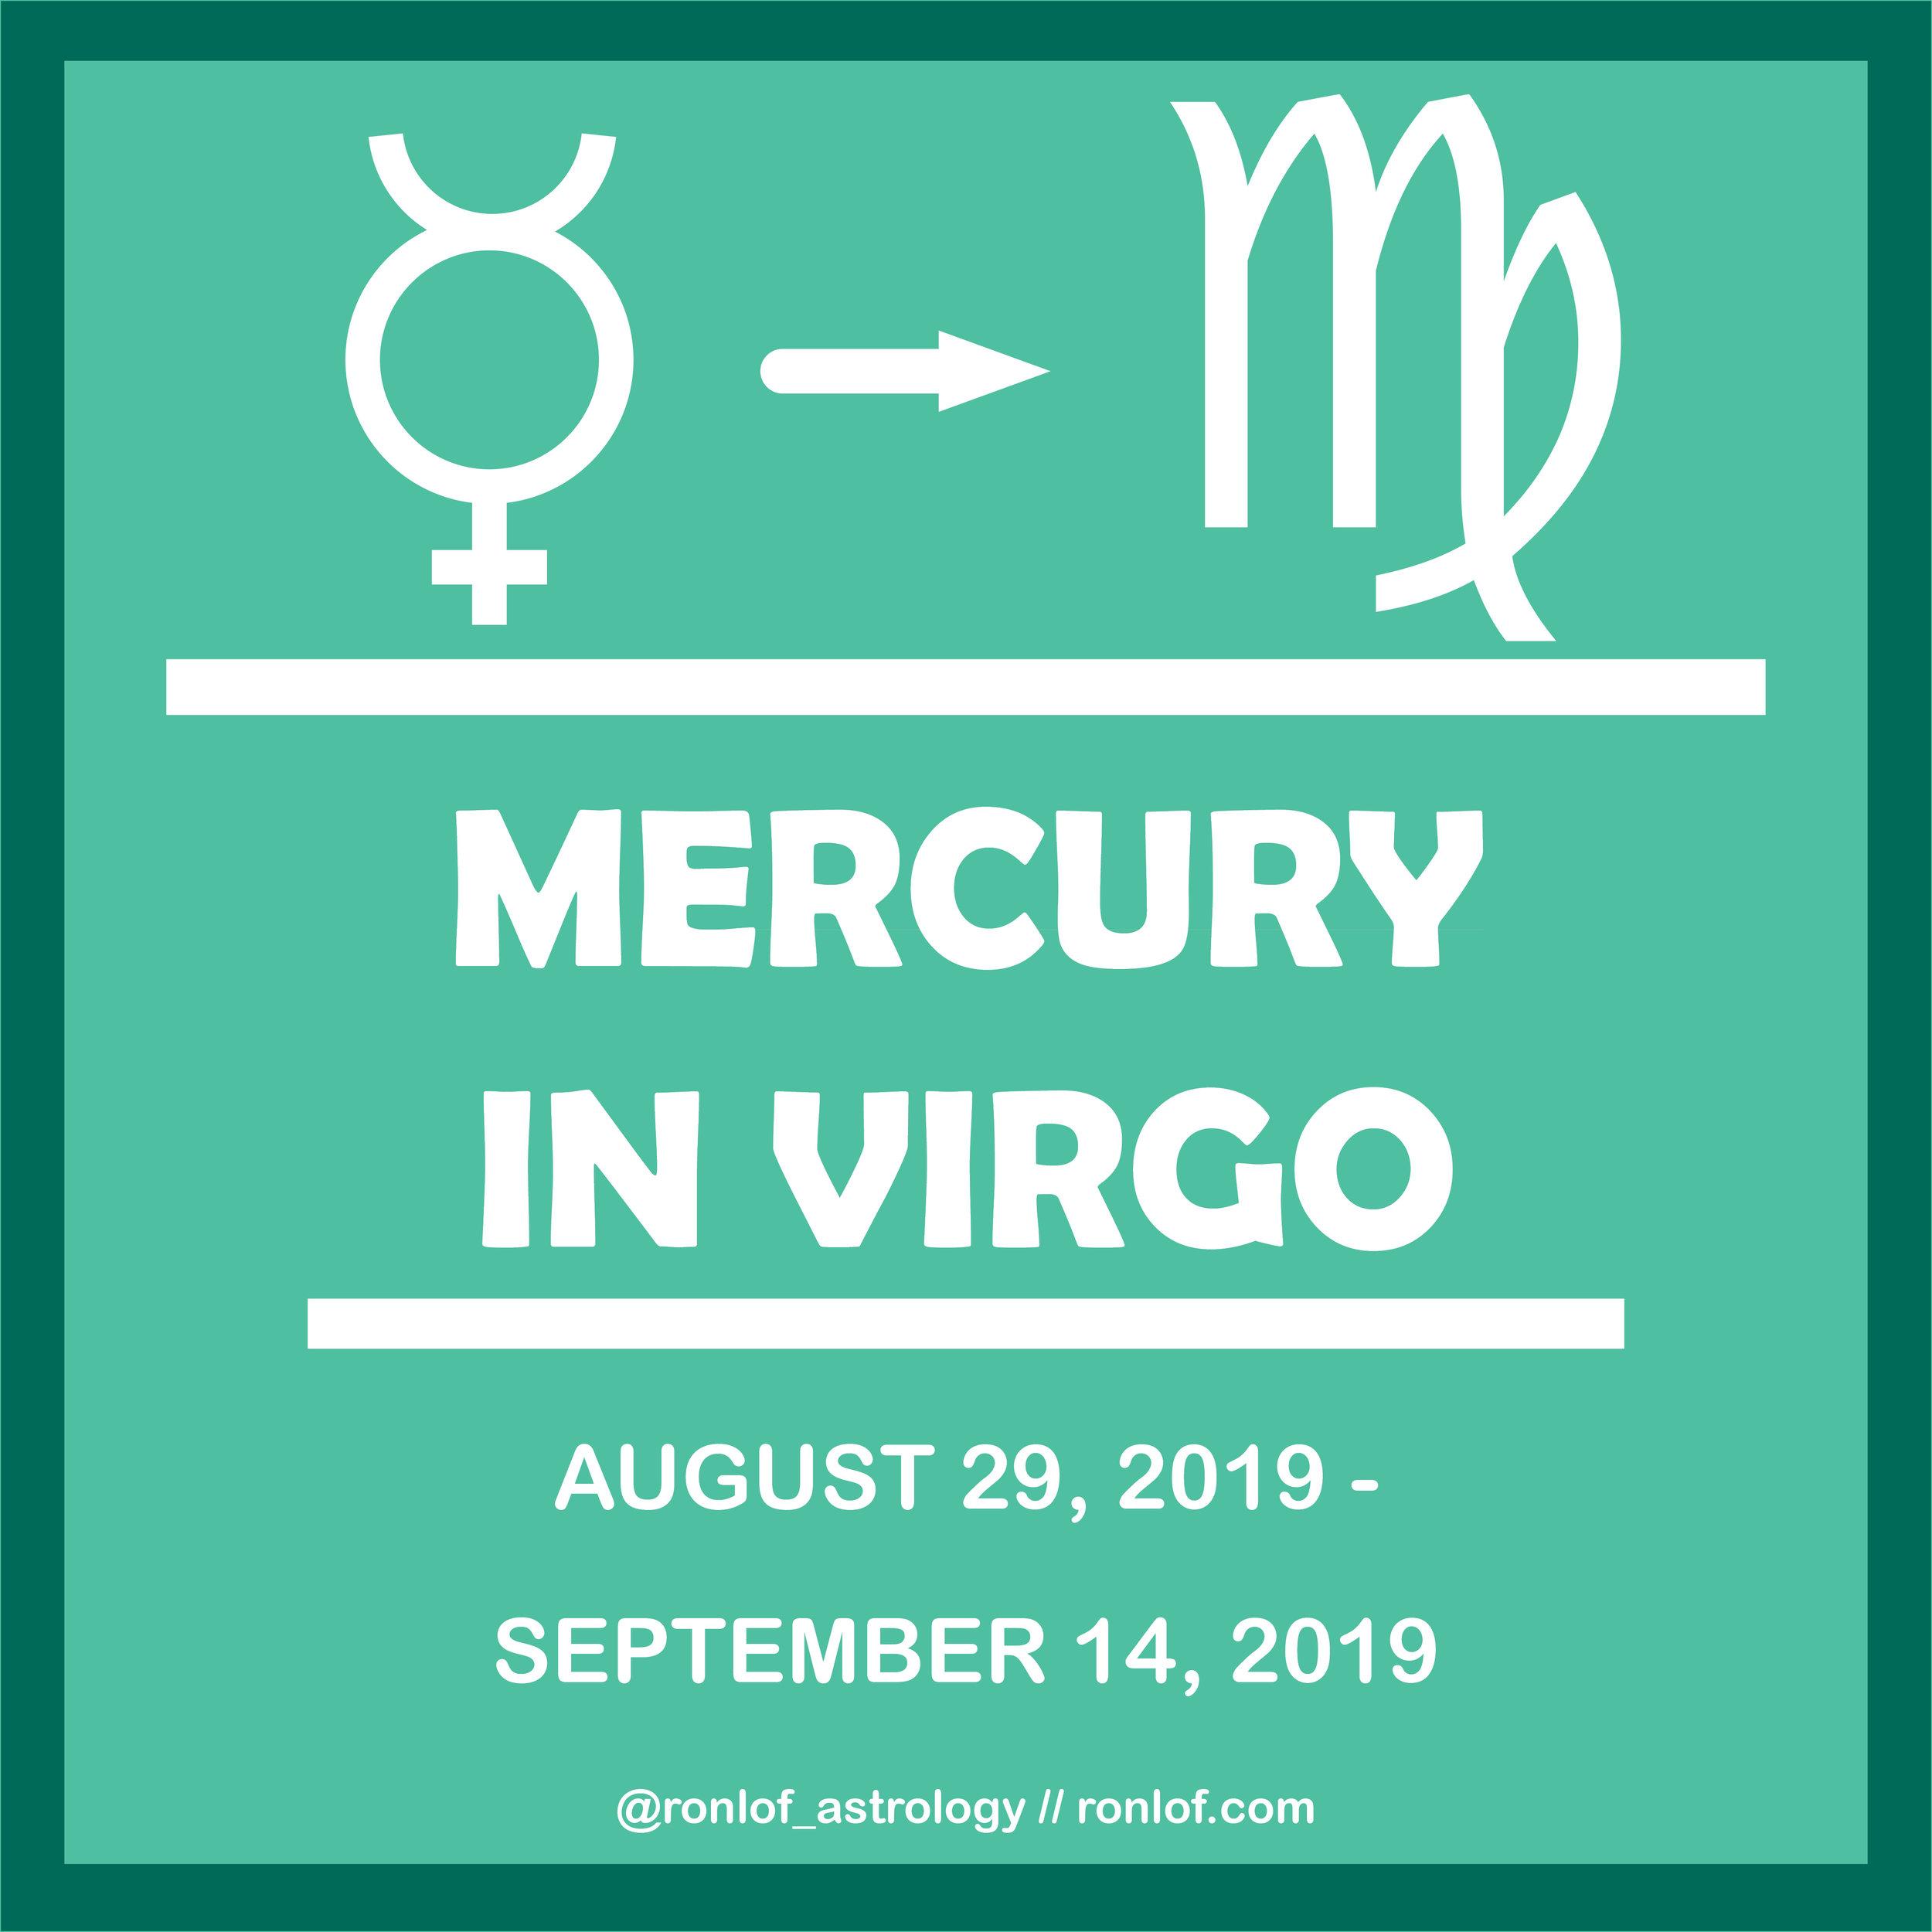 MercuryVirgo.jpg